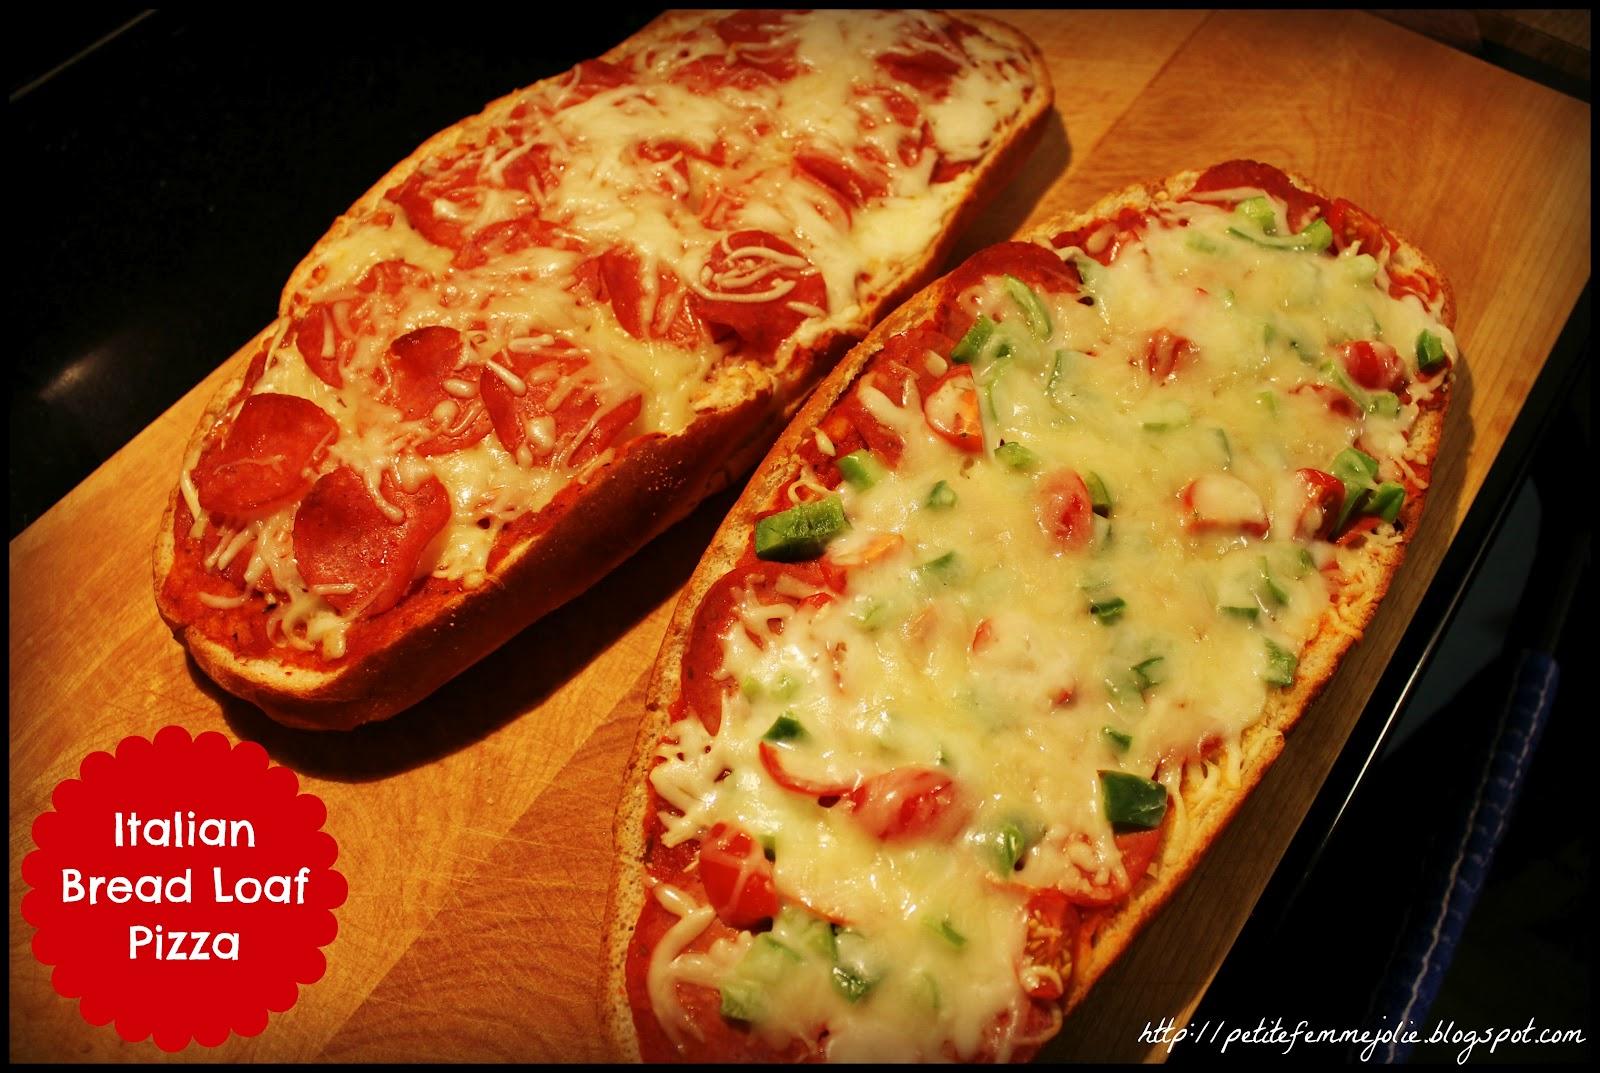 petite femme jolie: Tasty Tuesday - Italian Bread Loaf Pizza